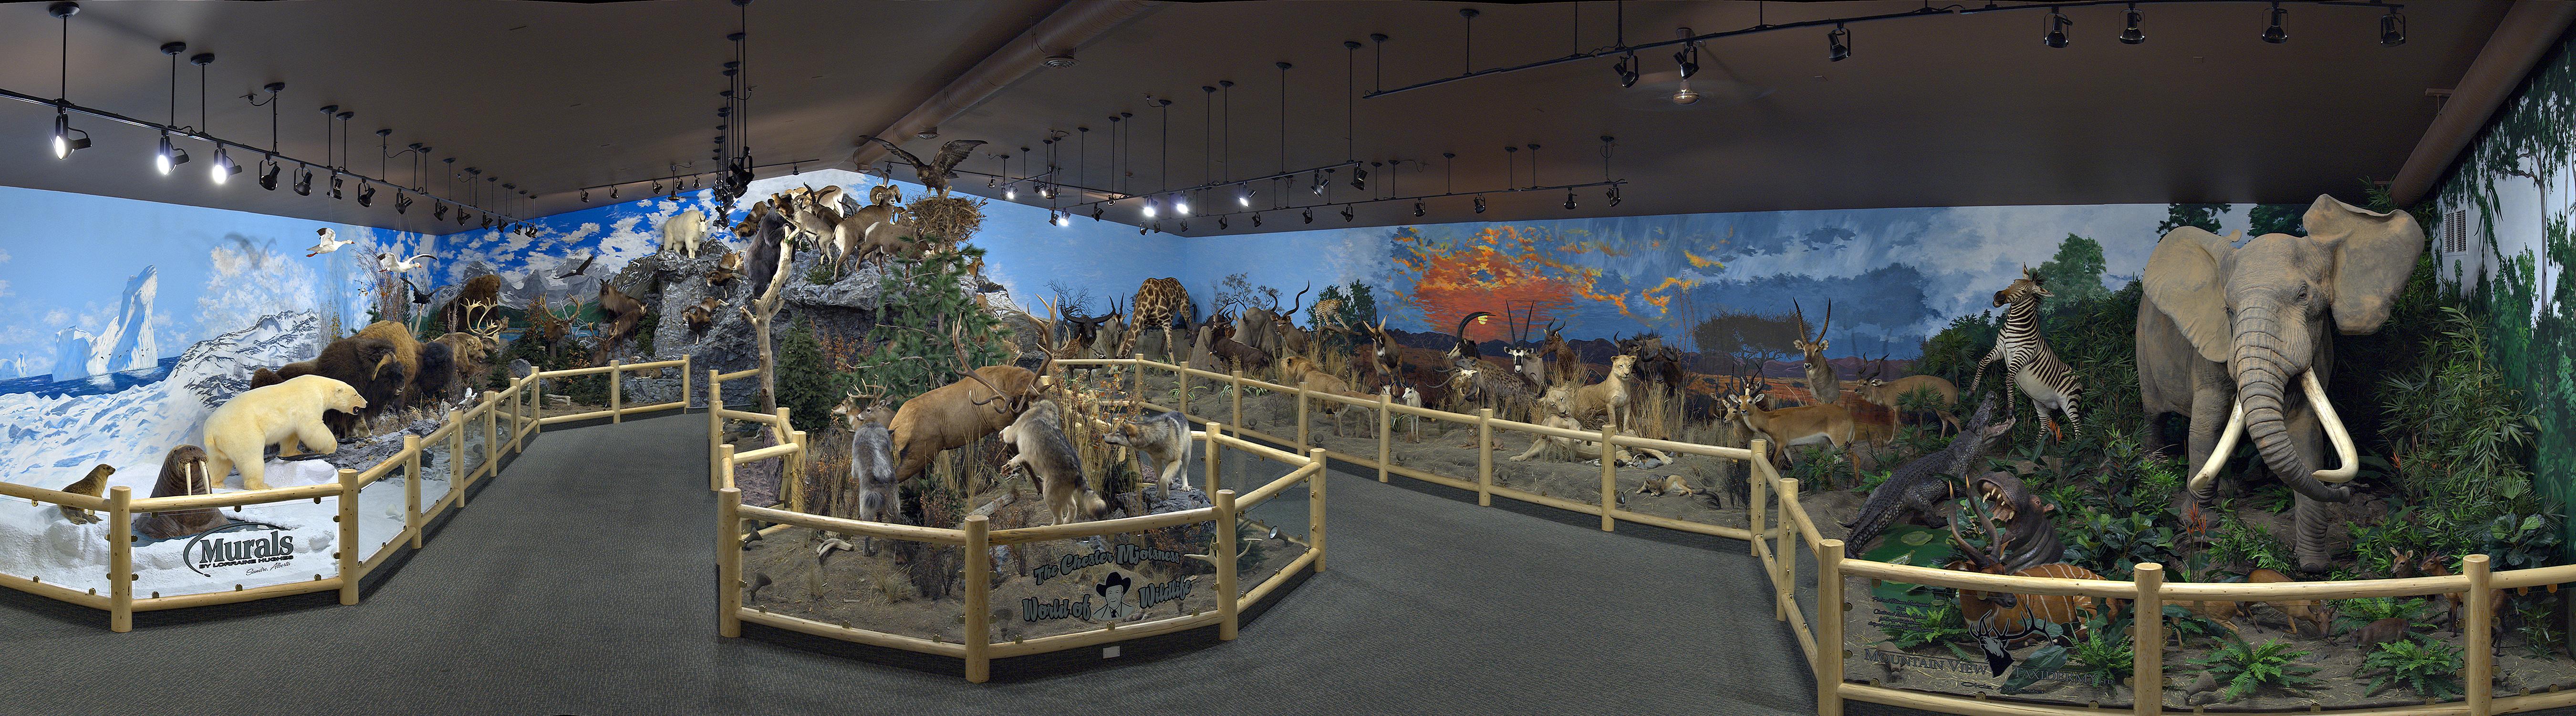 Wildlife Exhibit Panoramic